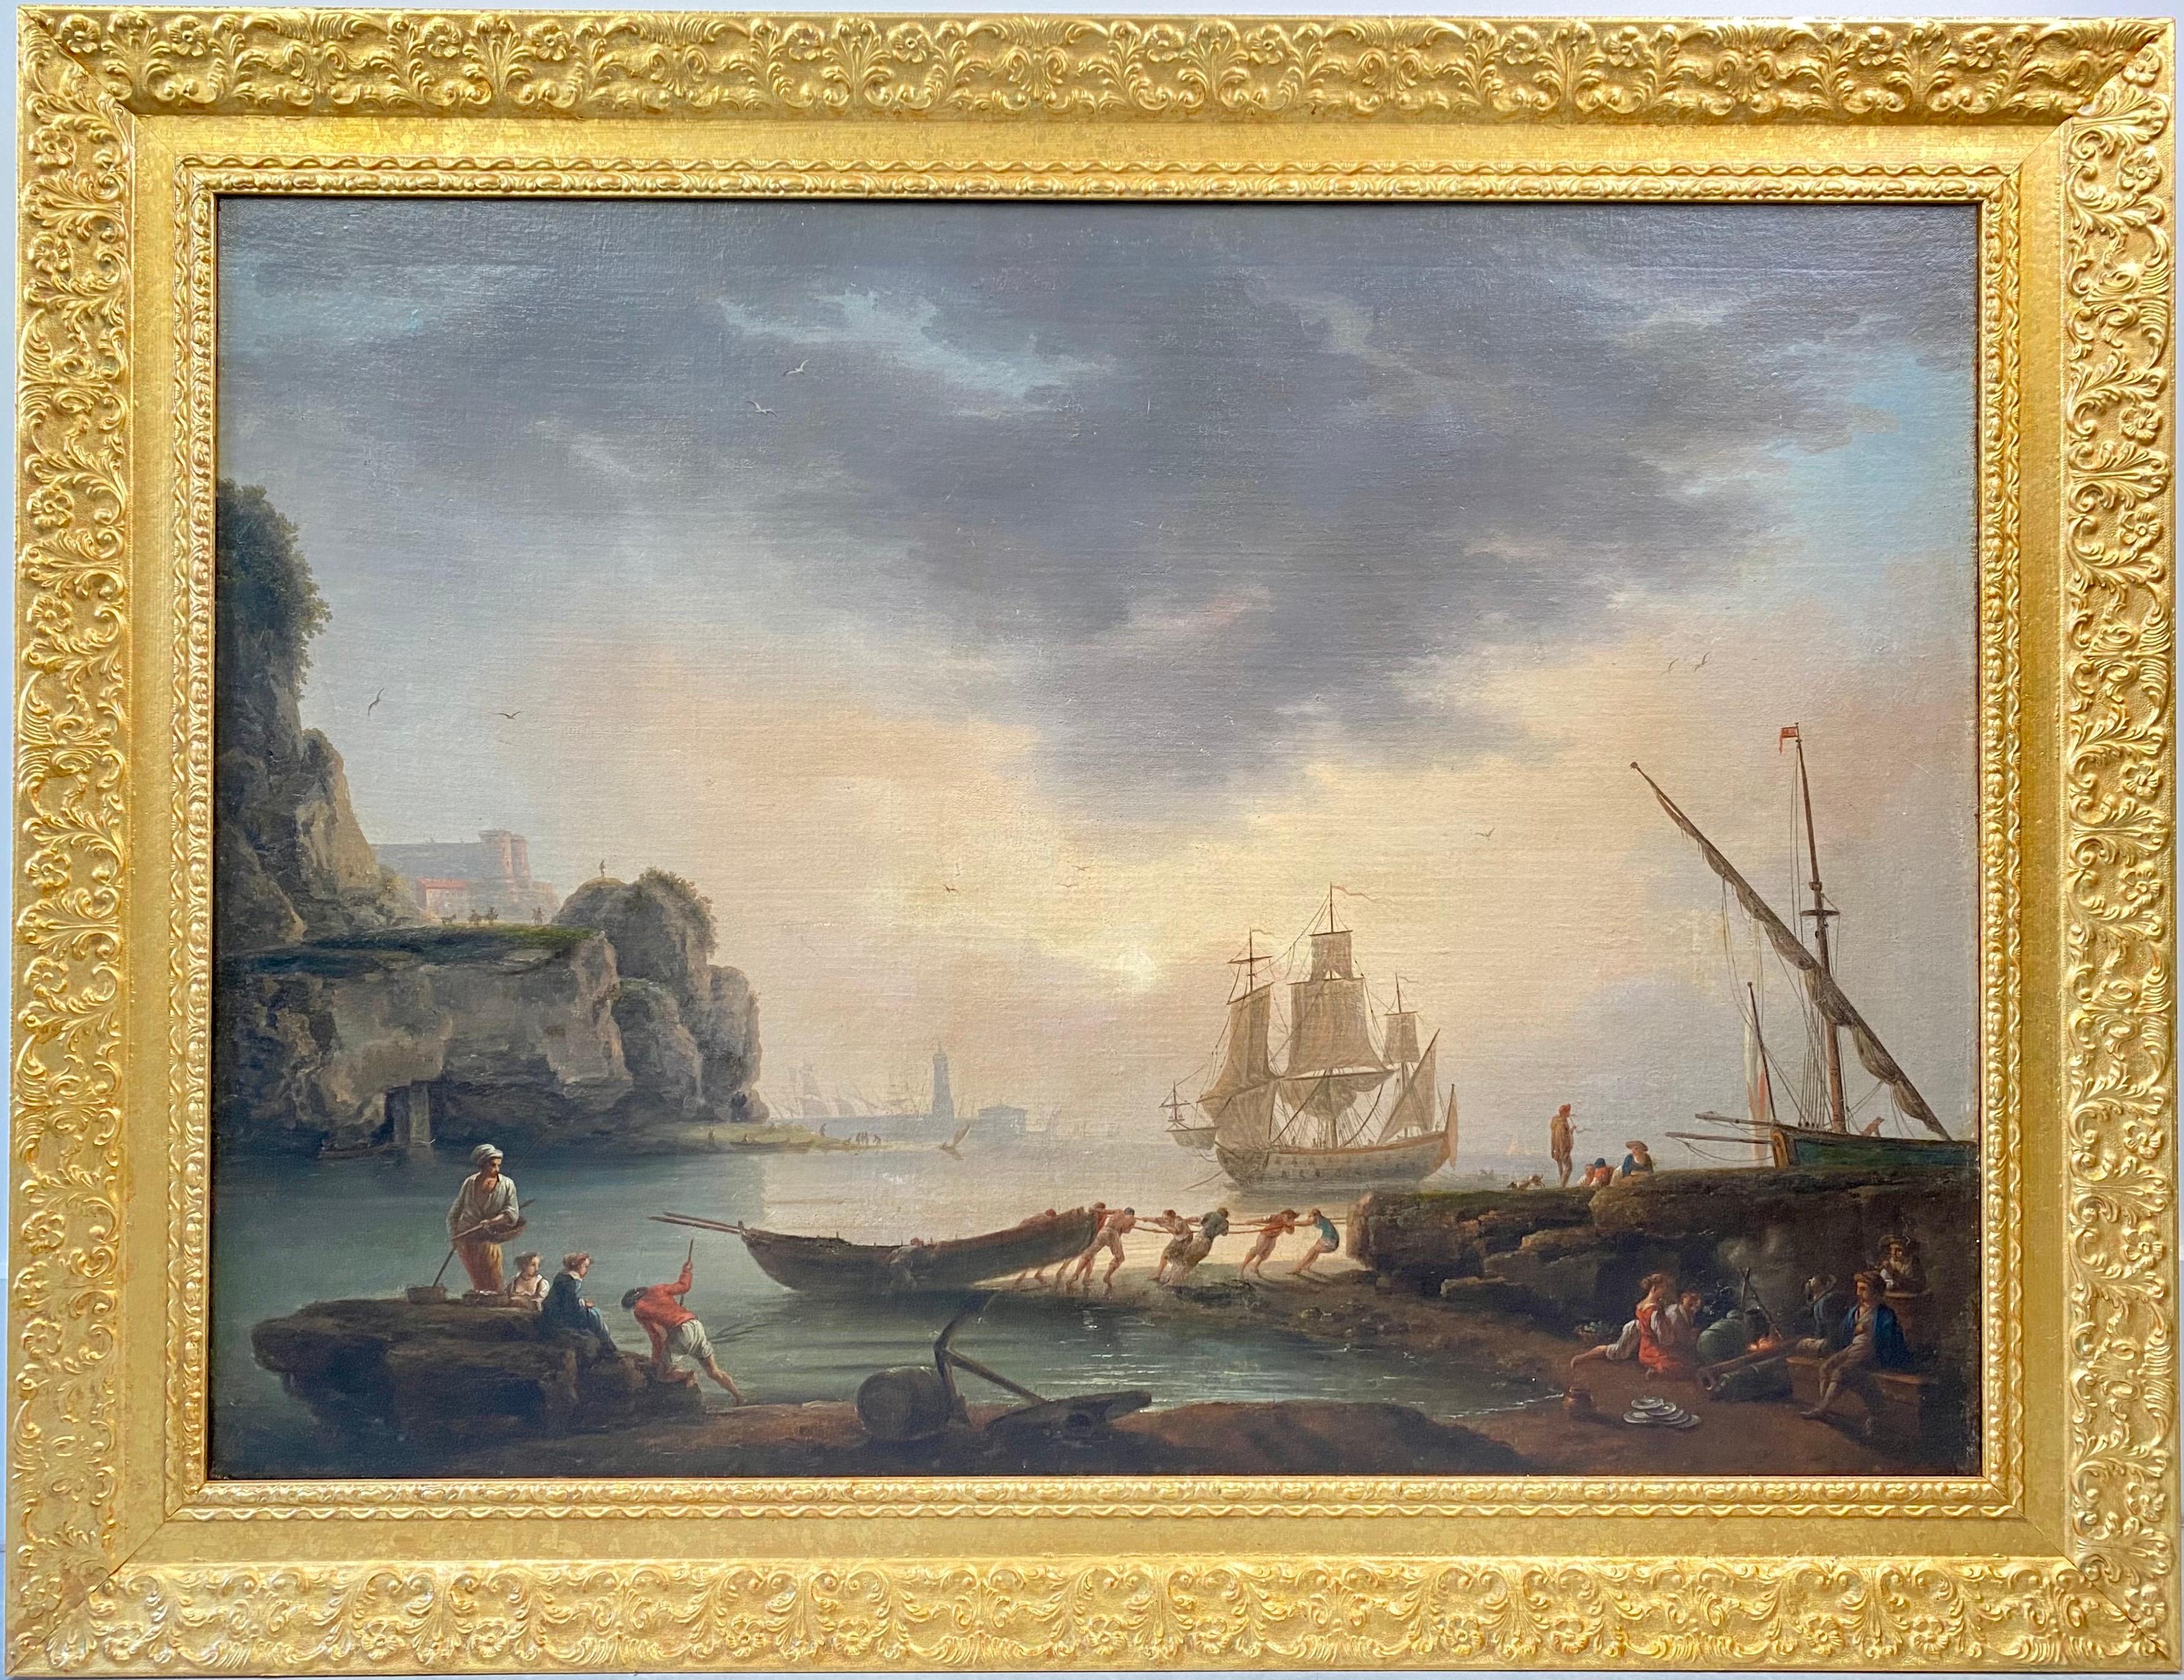 18th century Mediterranean Harbour landscape painting - View of Marseille